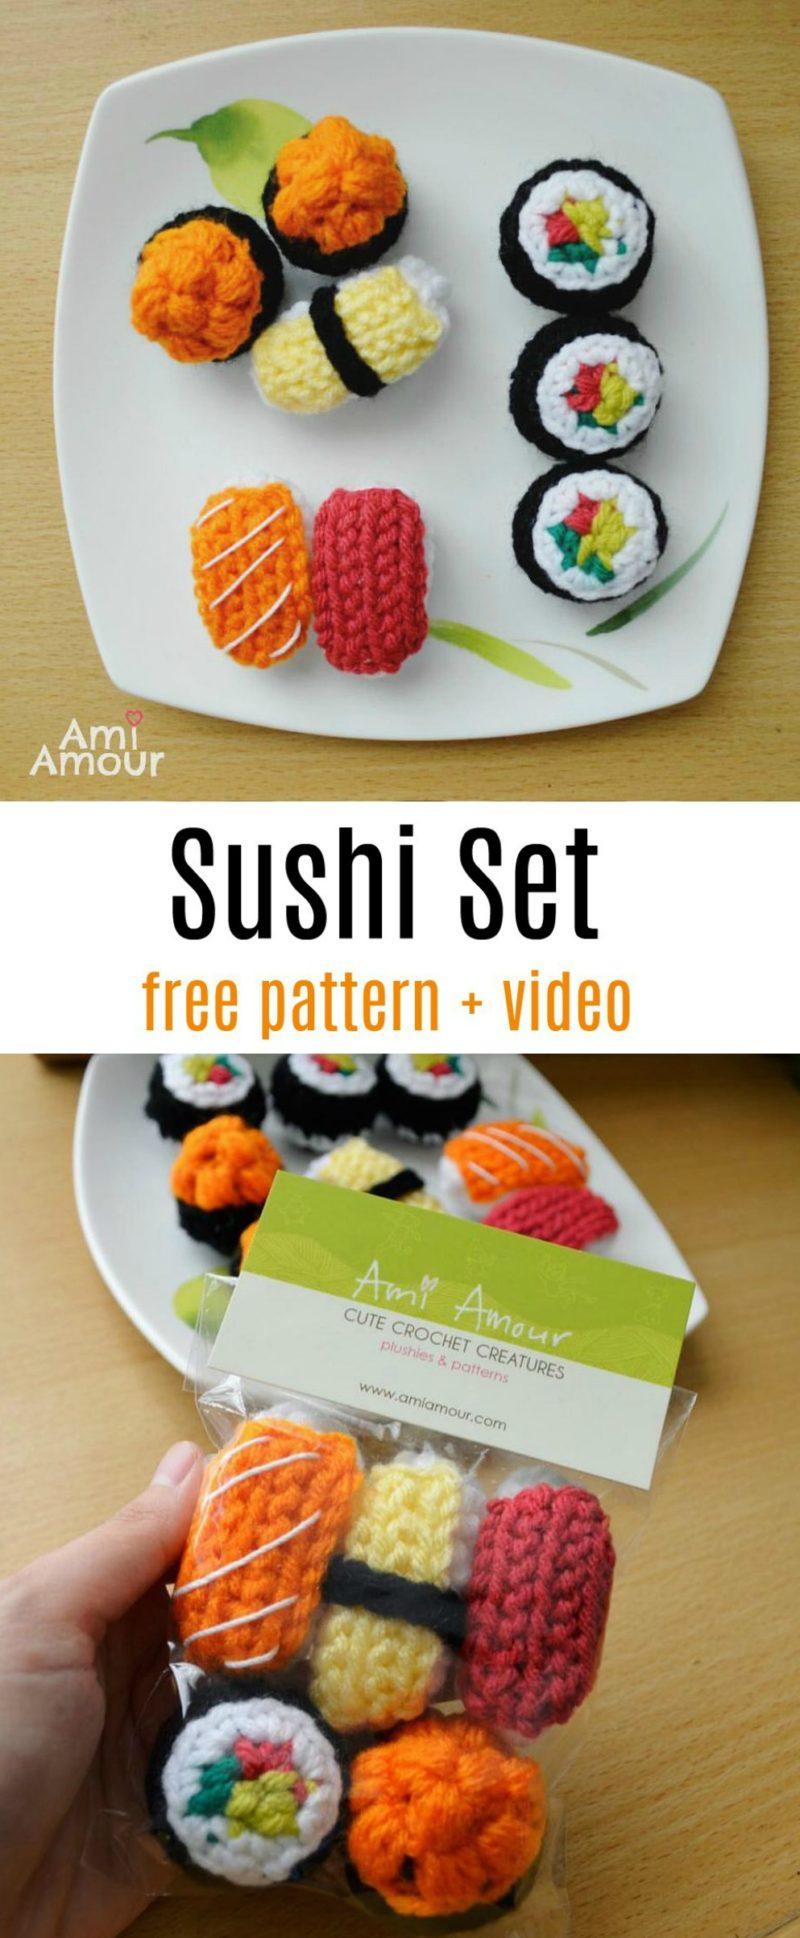 Sushi Crochet Pattern - Amigurumi Food | Crochet amigurumi free ... | 1938x800